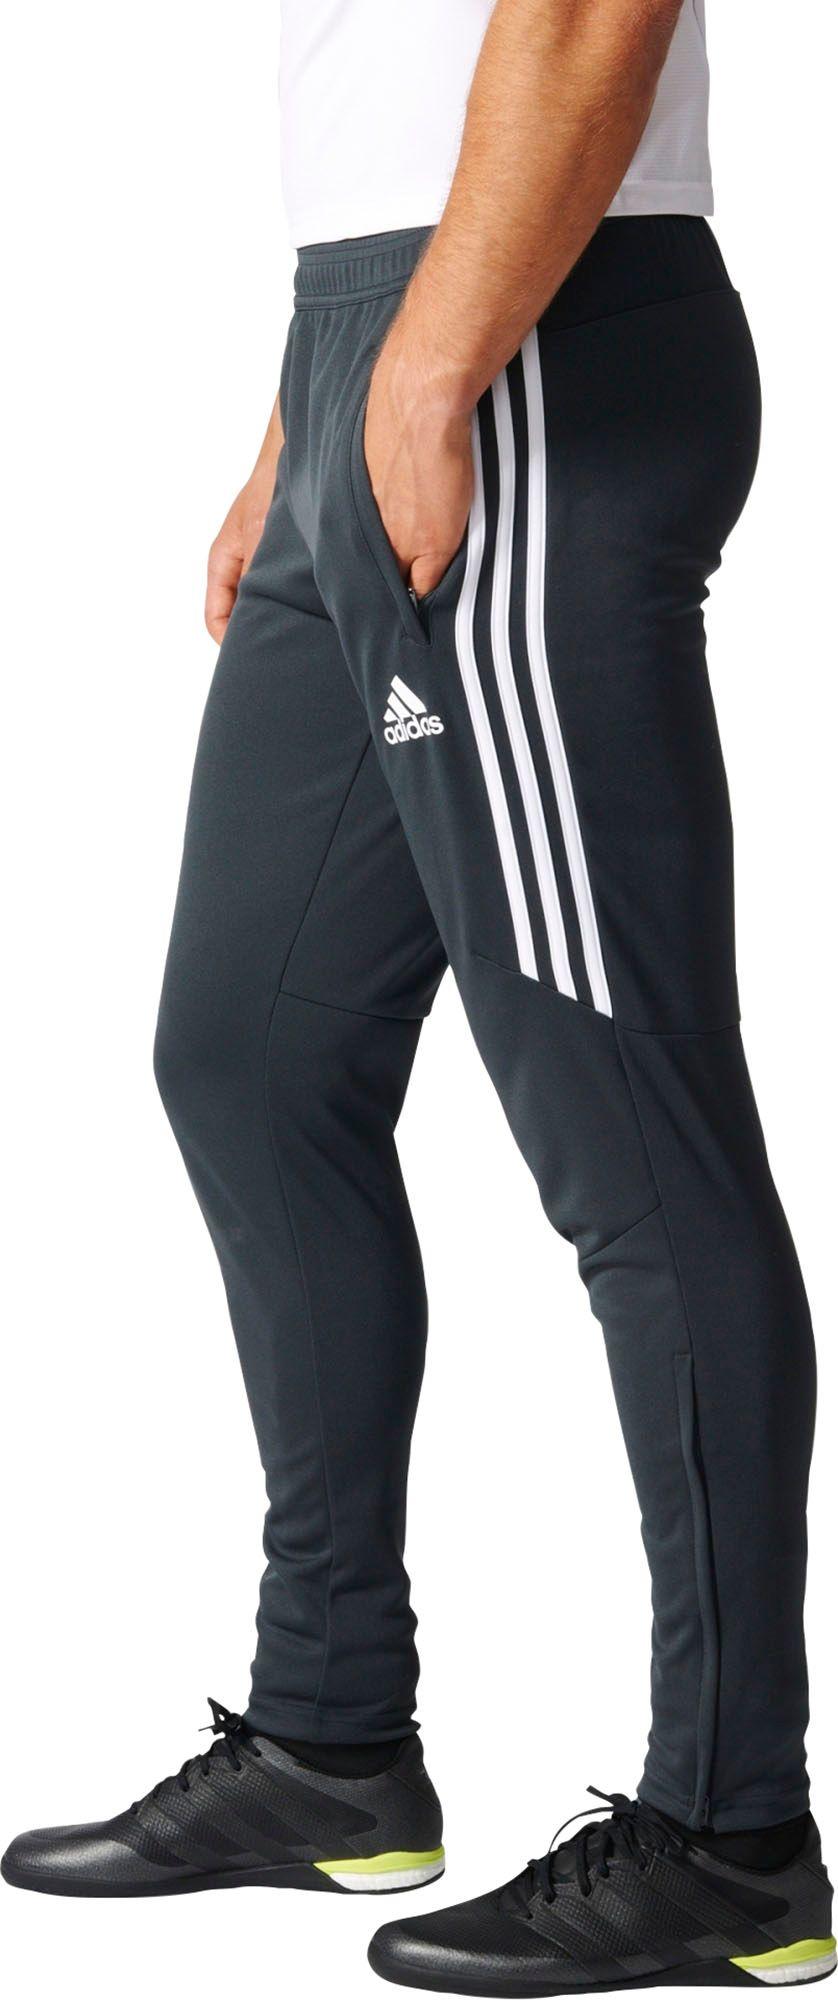 7b3f96211204a chic adidas Mens Tiro 17 Soccer Pants DICKS Sporting Goods ...